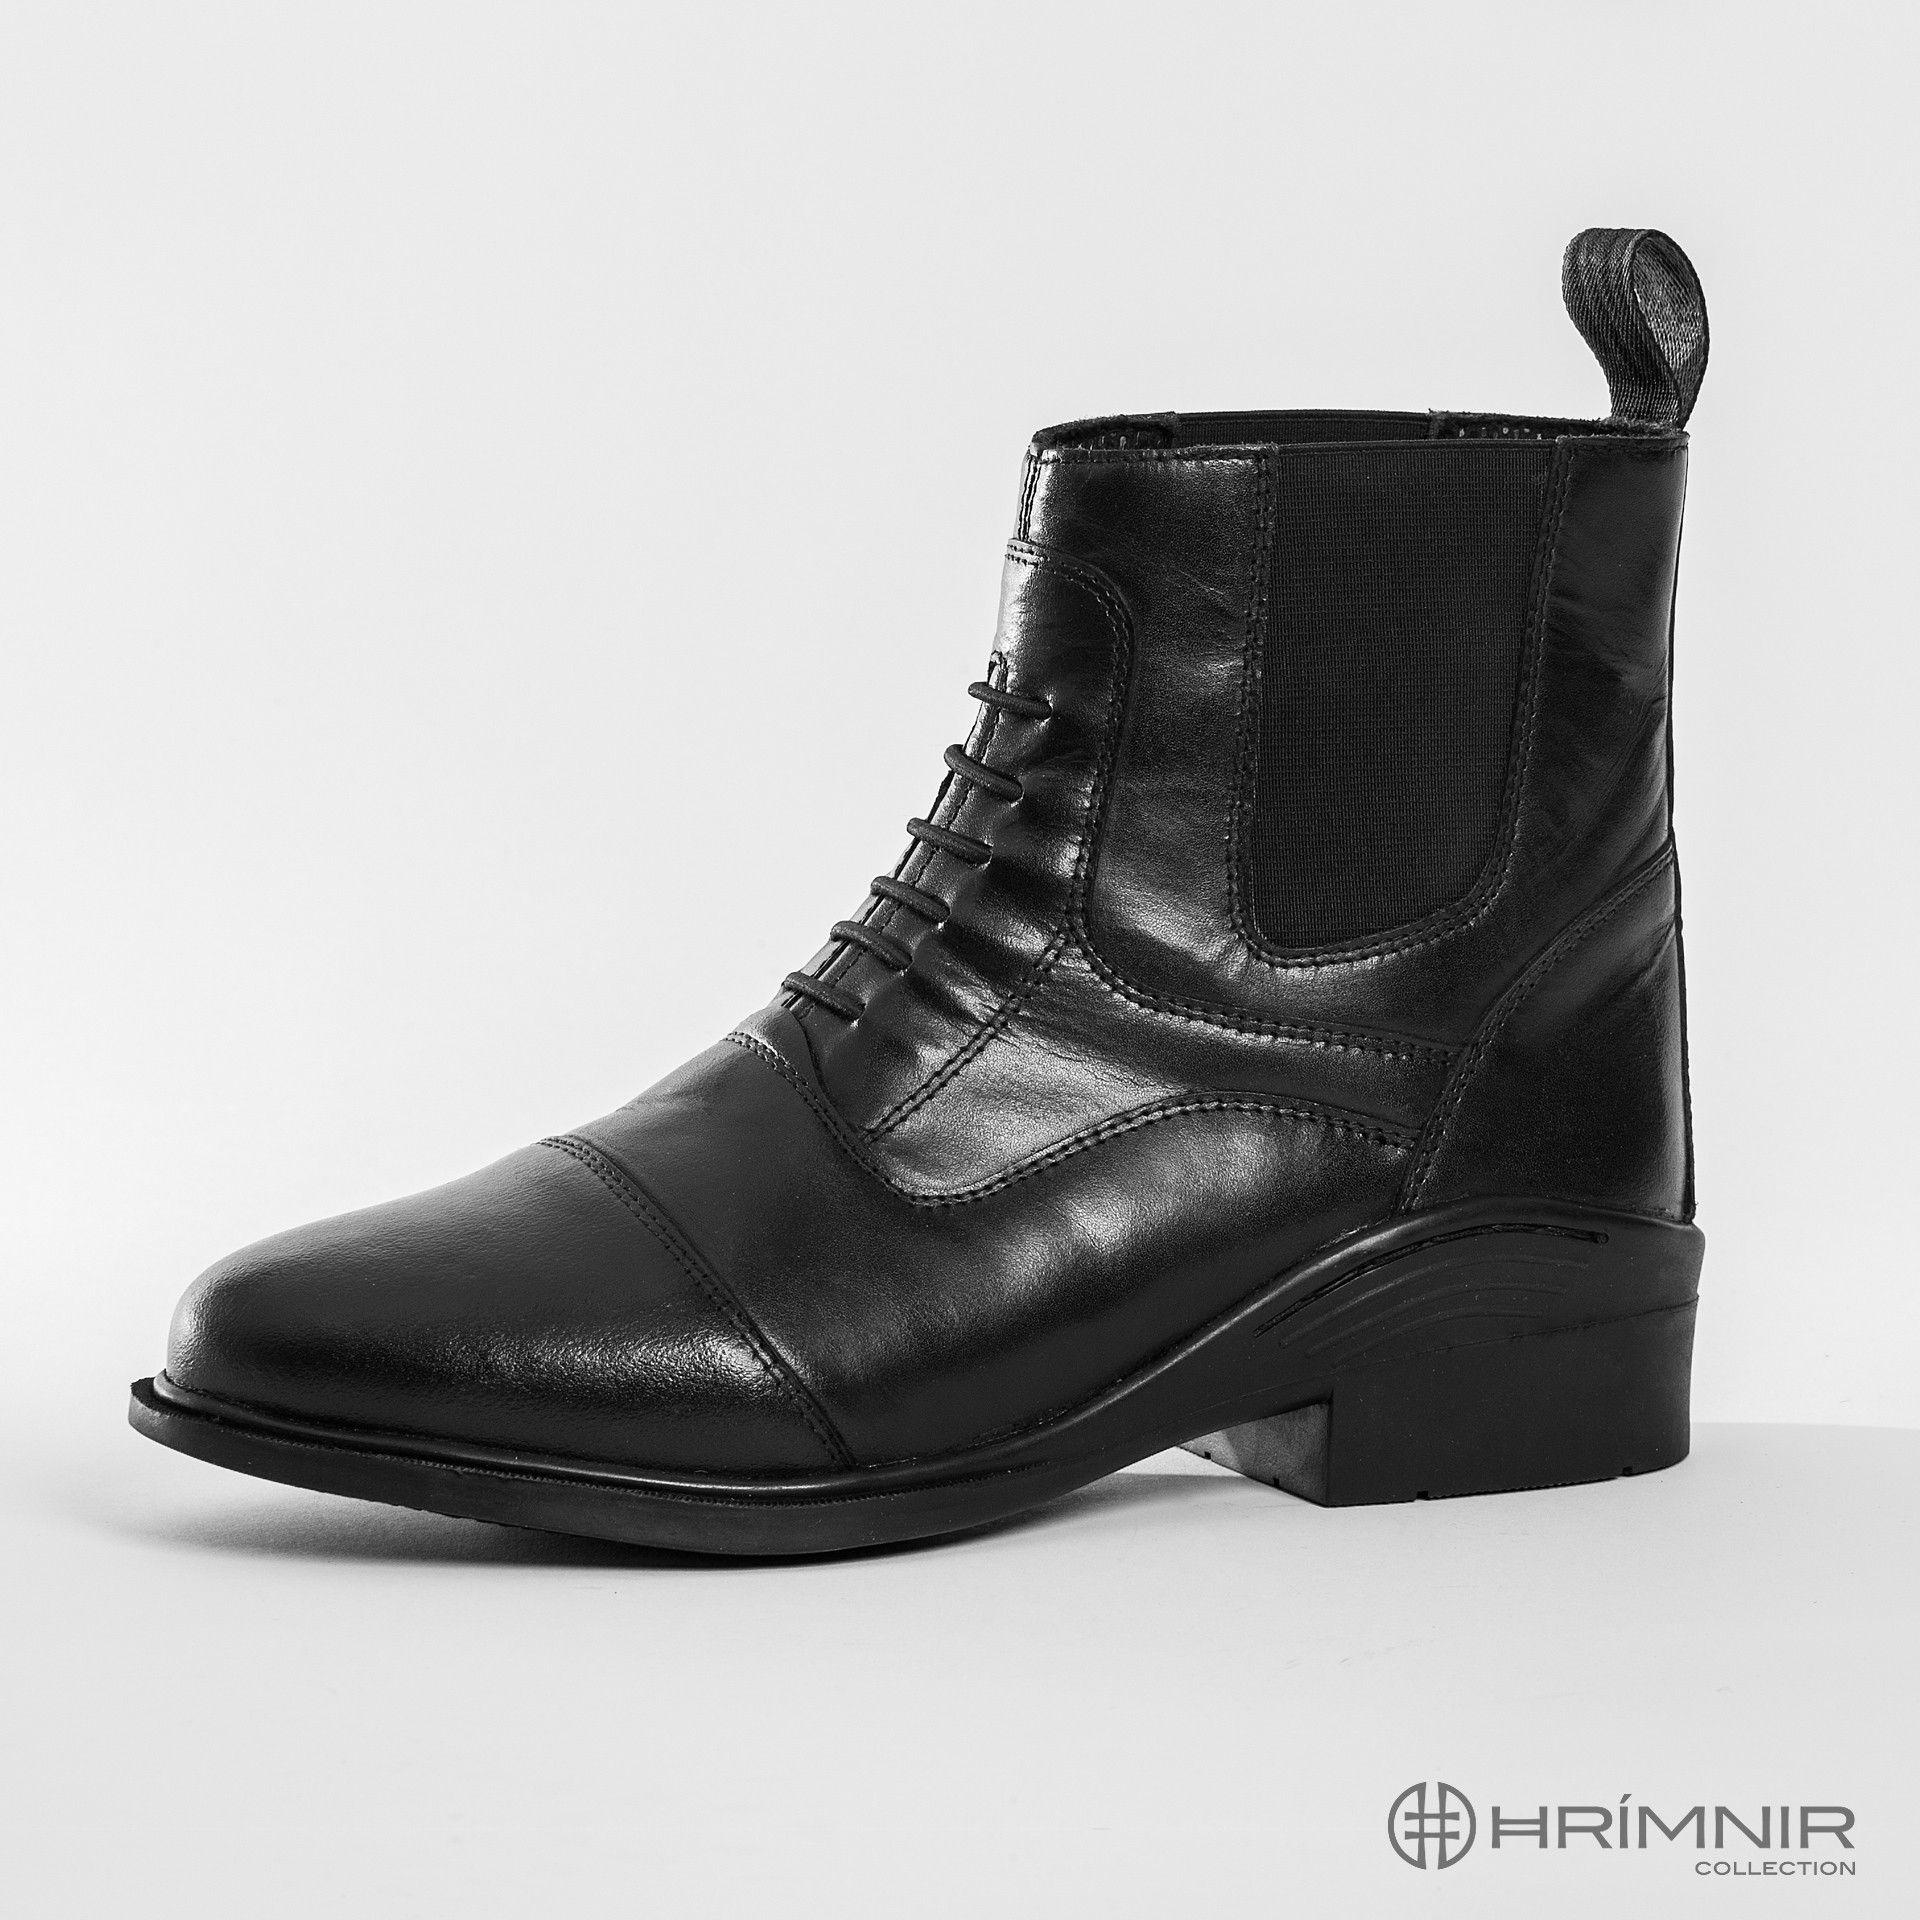 Jodphur boots front elastic